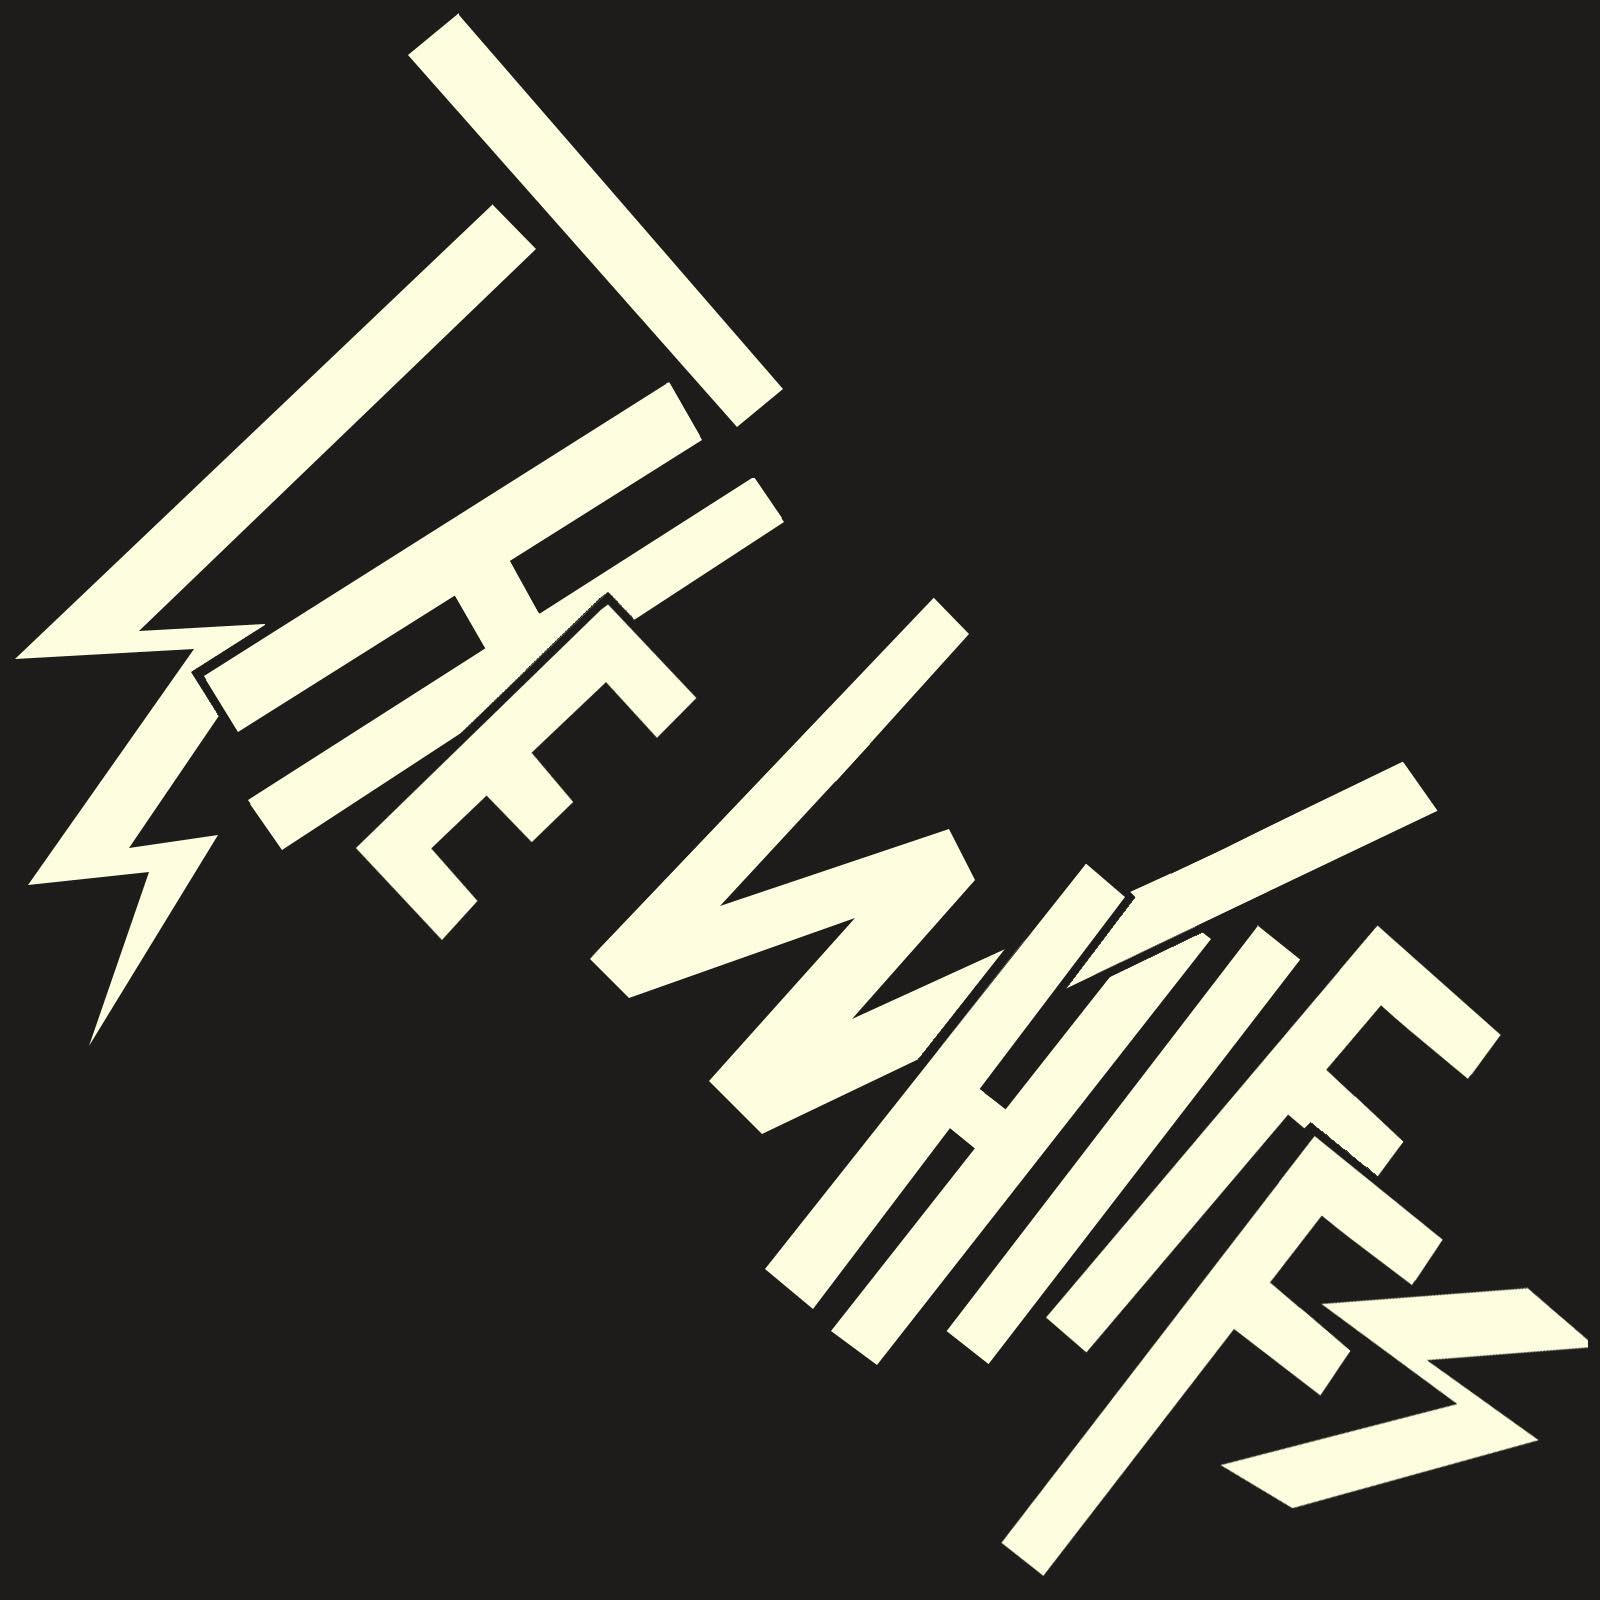 The Whiffs